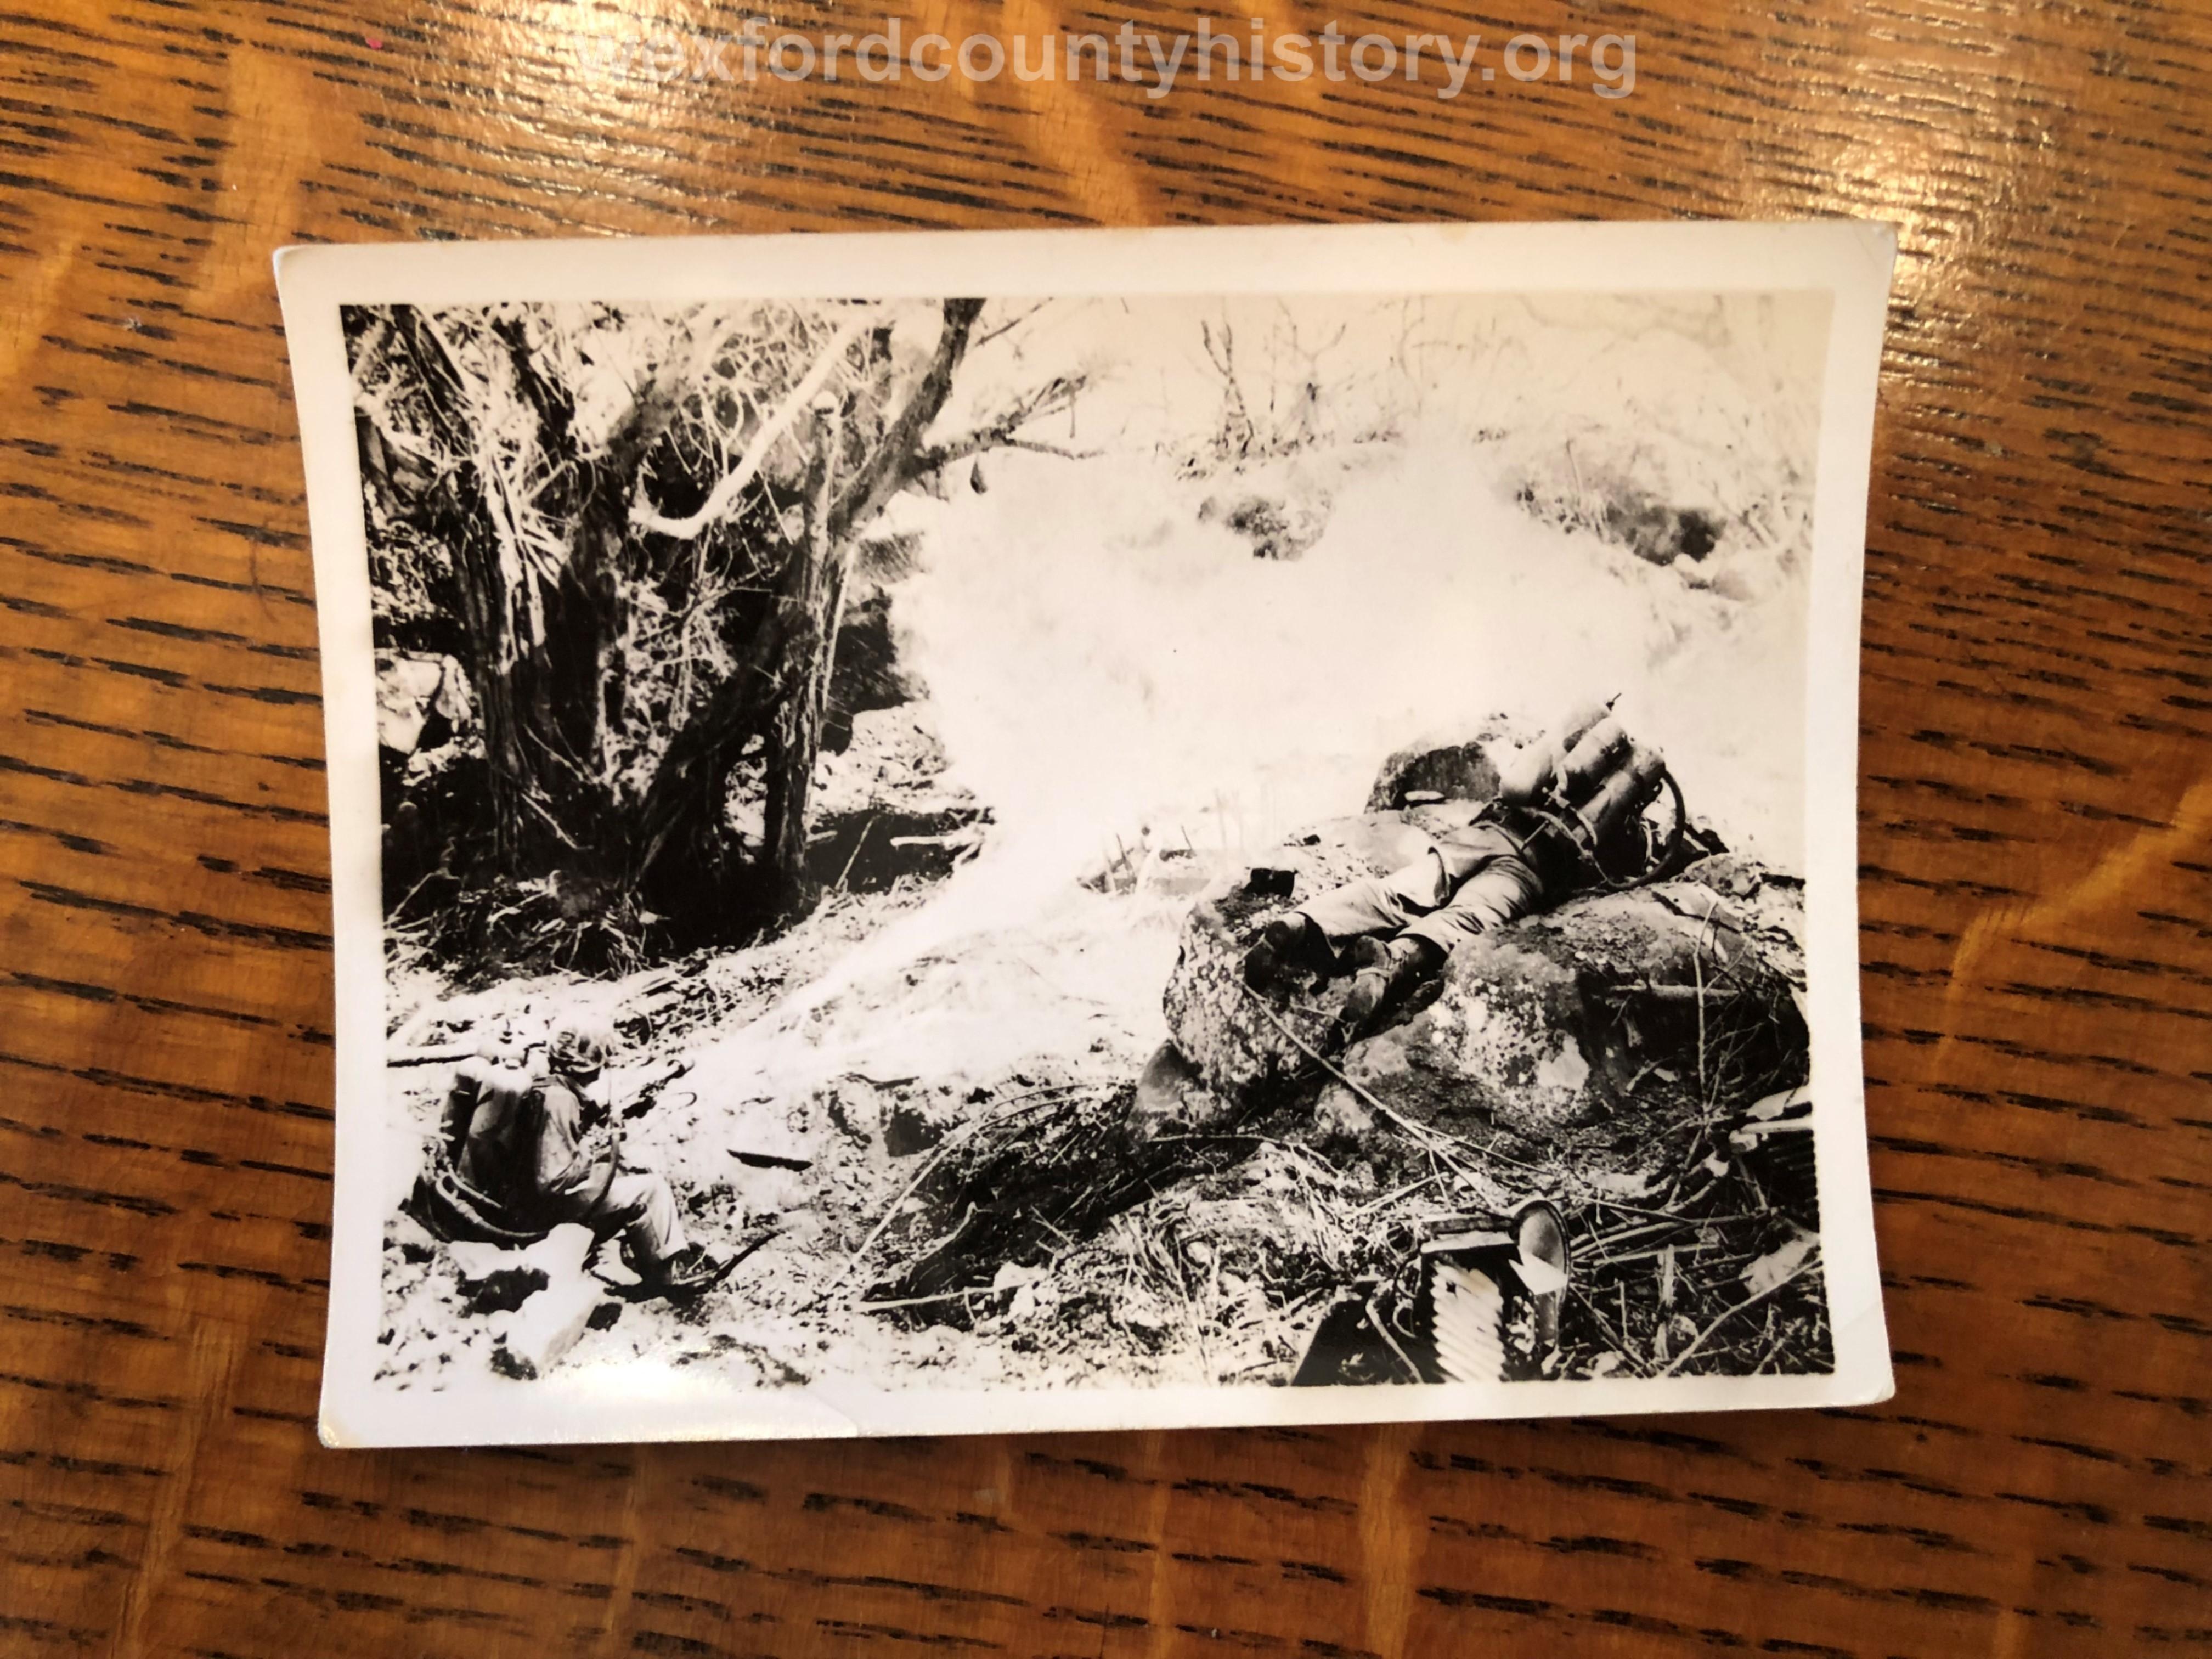 Cadillac-Veterans-Paul-Johnson-World-War-2-Photographs-32